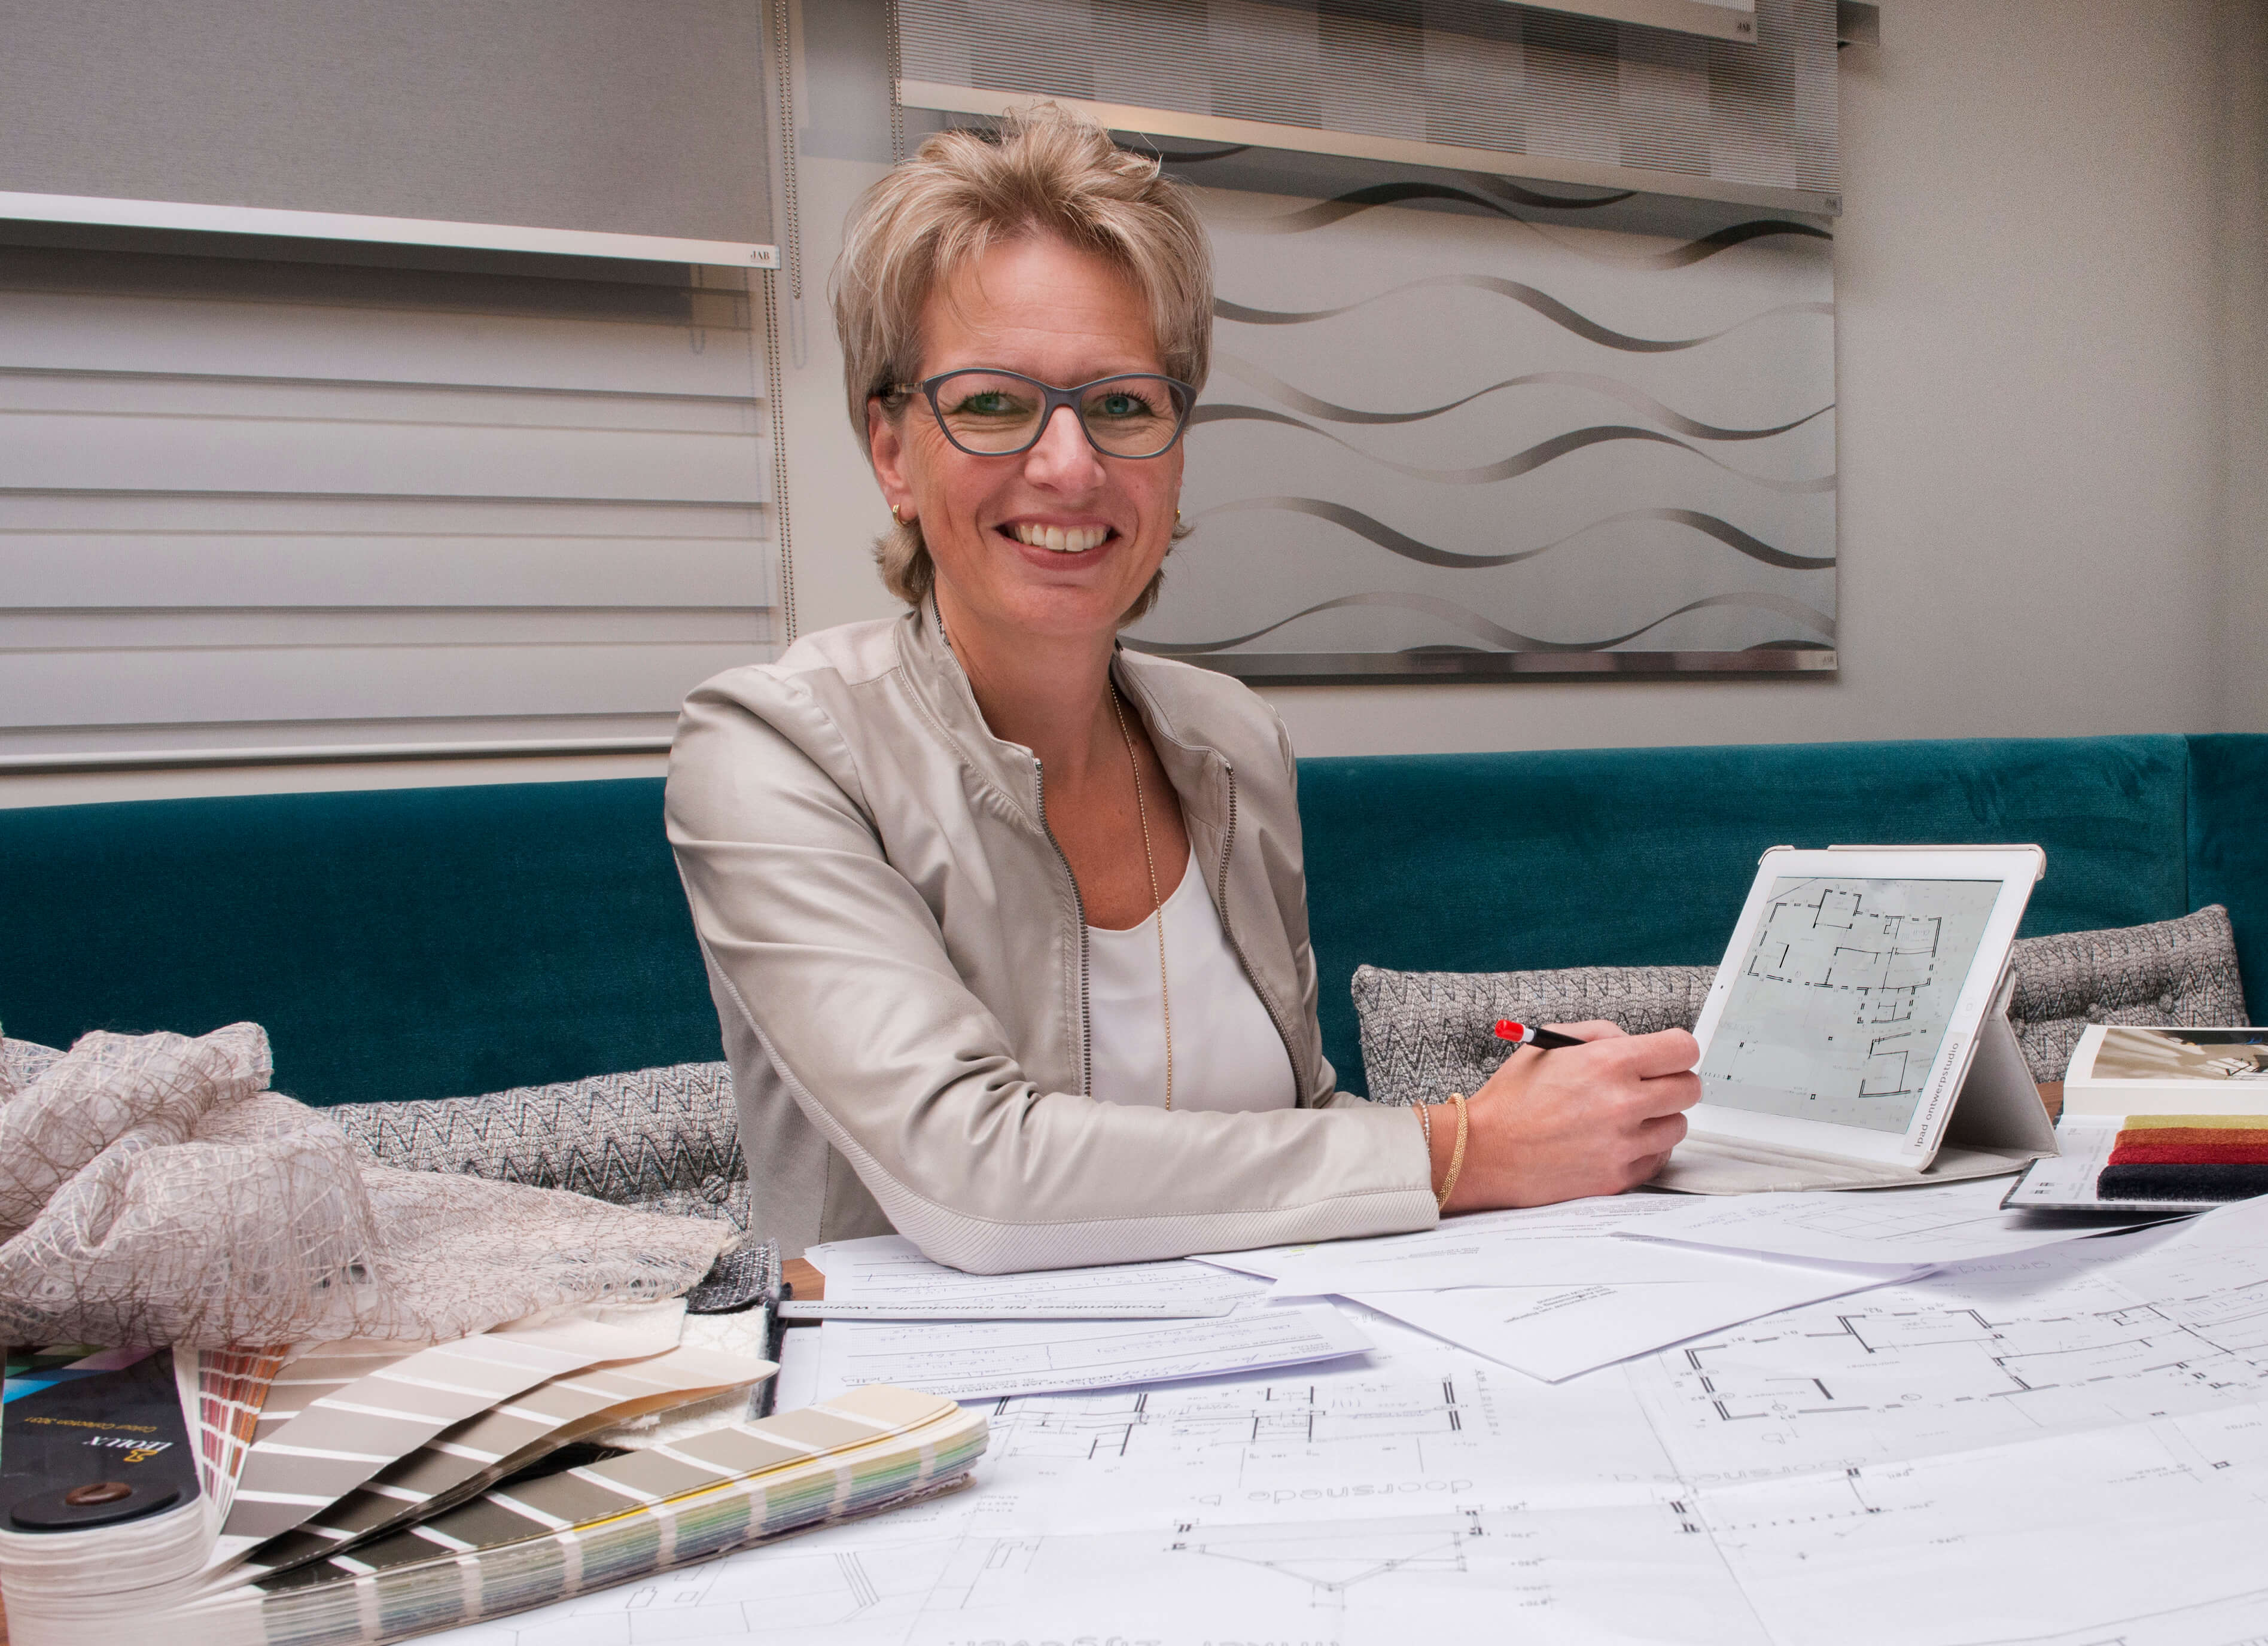 Yvonne Verhorevoort Interiordesigner